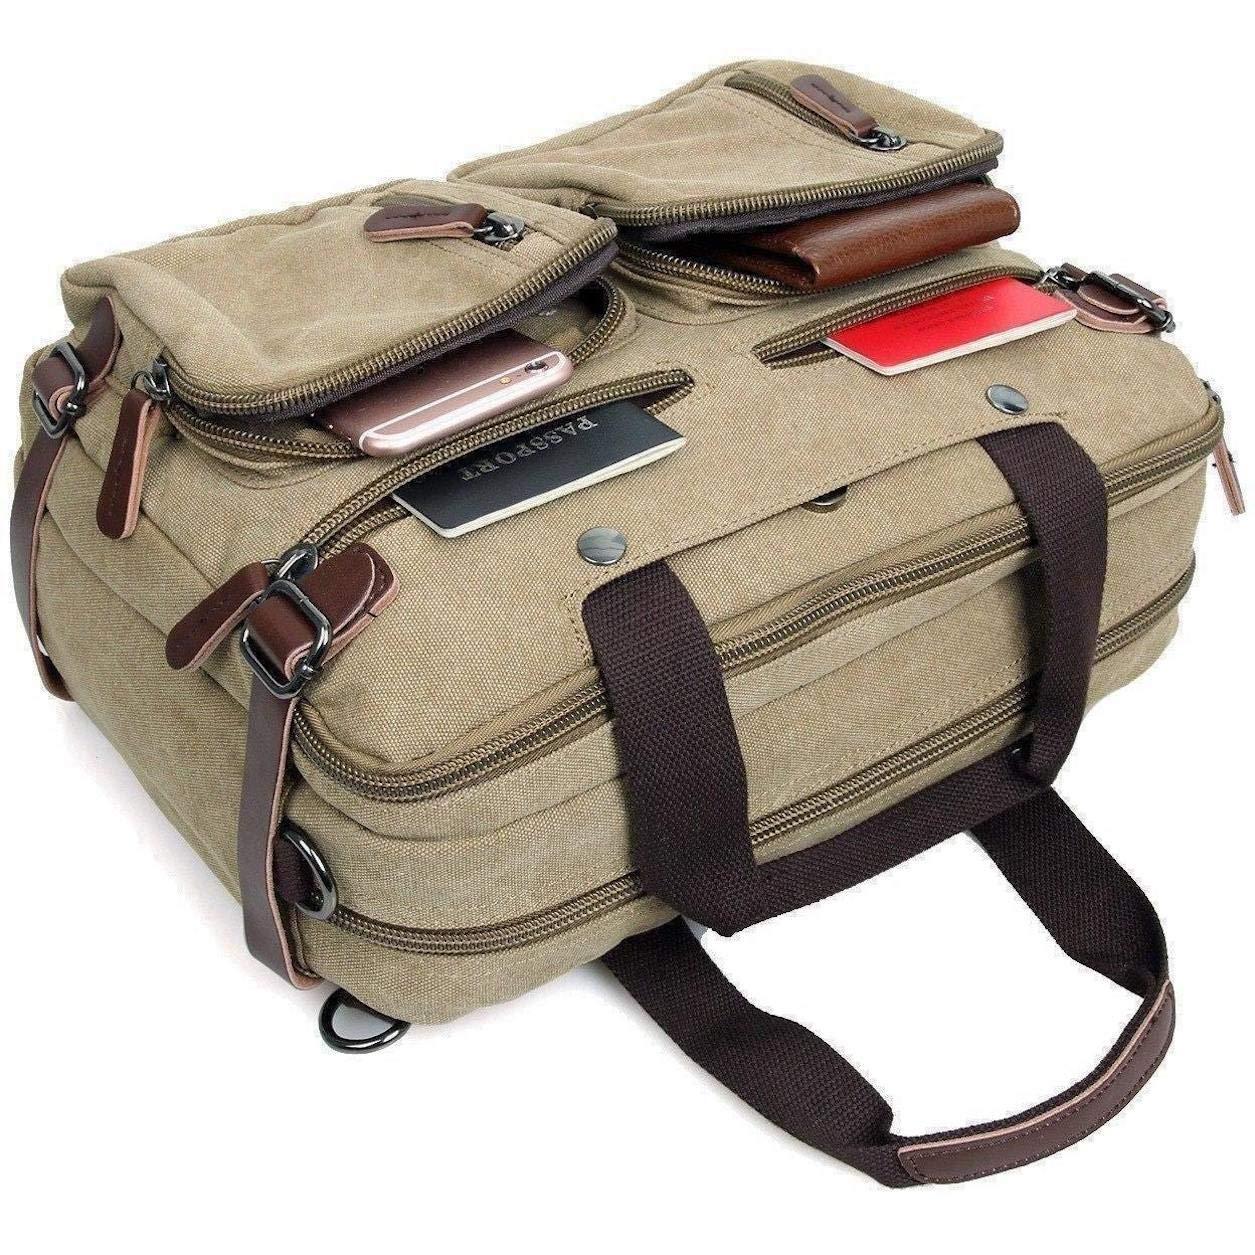 Clean Vintage Laptop Bag Hybrid Backpack Messenger Bag/Convertible Briefcase Backpack Satchel for Men Women- BookBag Rucksack Daypack-Waxed Canvas Leather, Khaki